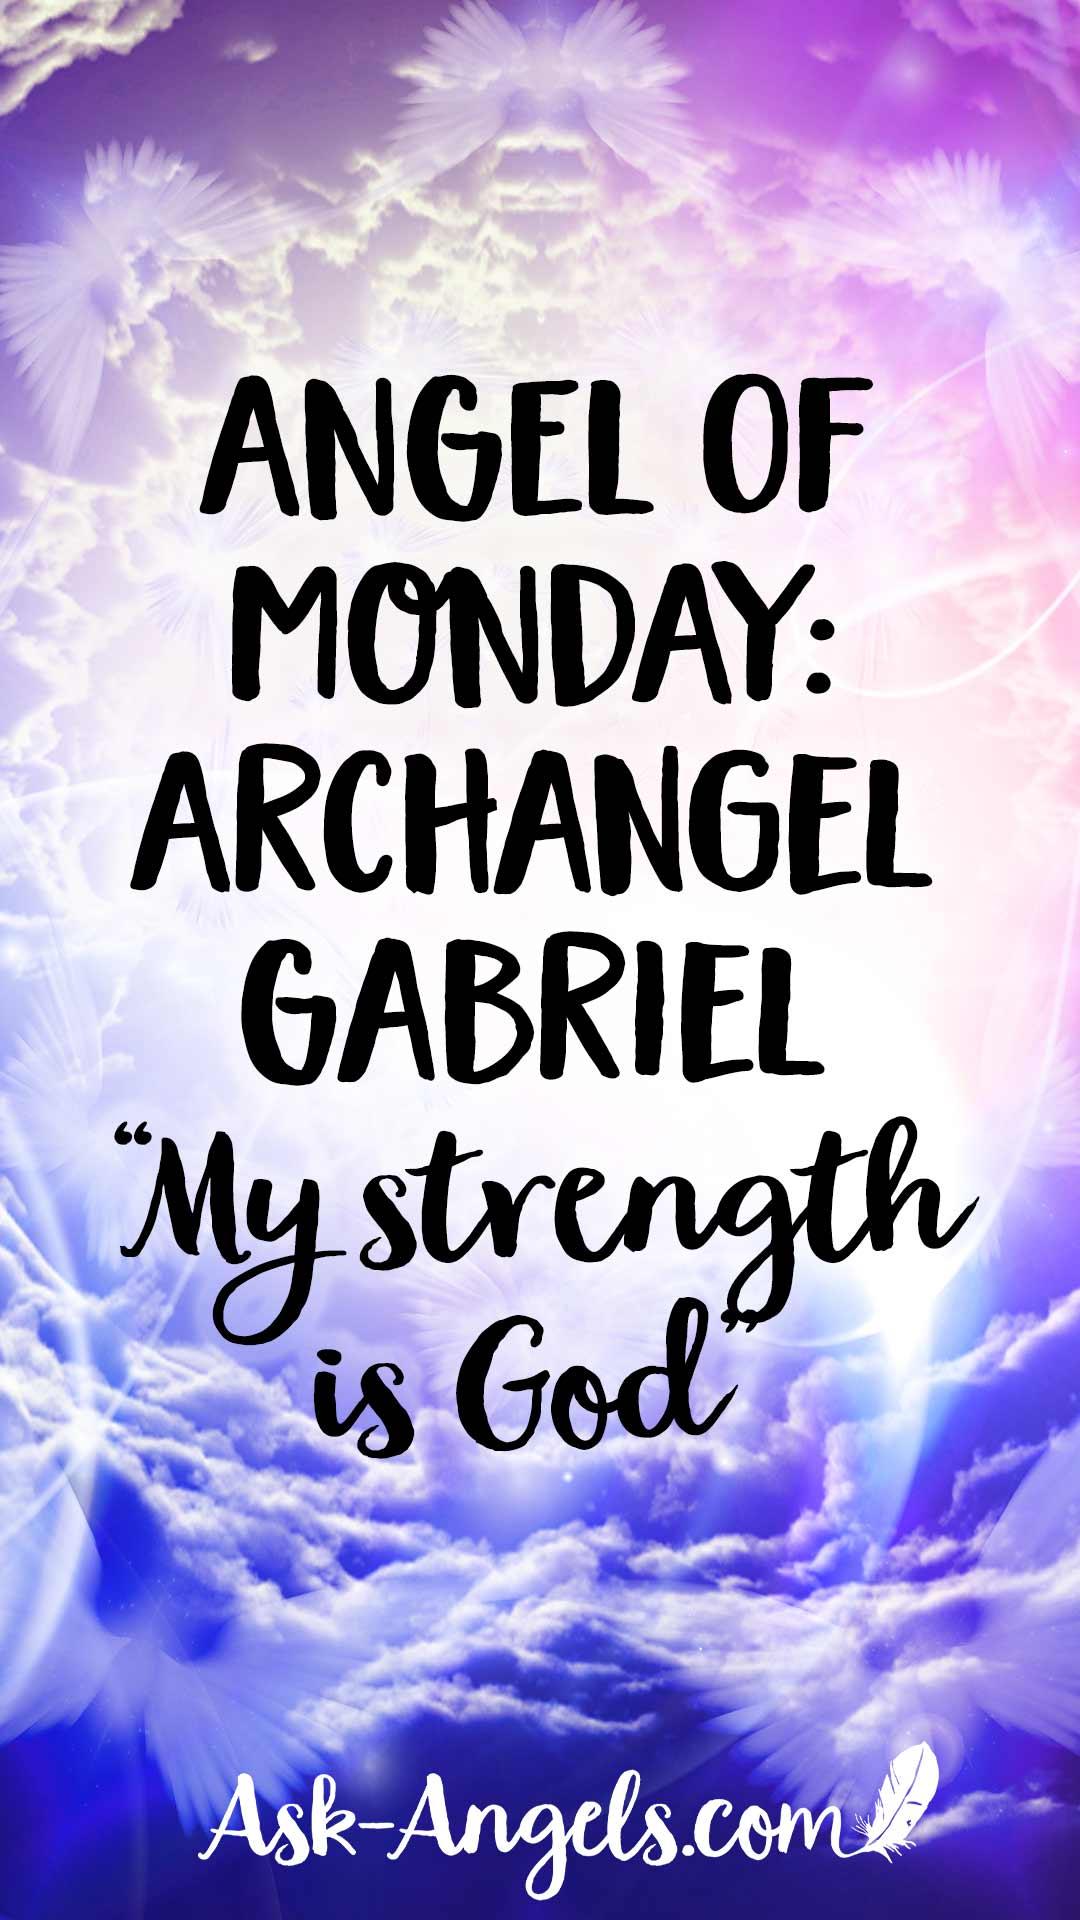 Angel of Monday- Archangel Gabriel- My strength is God